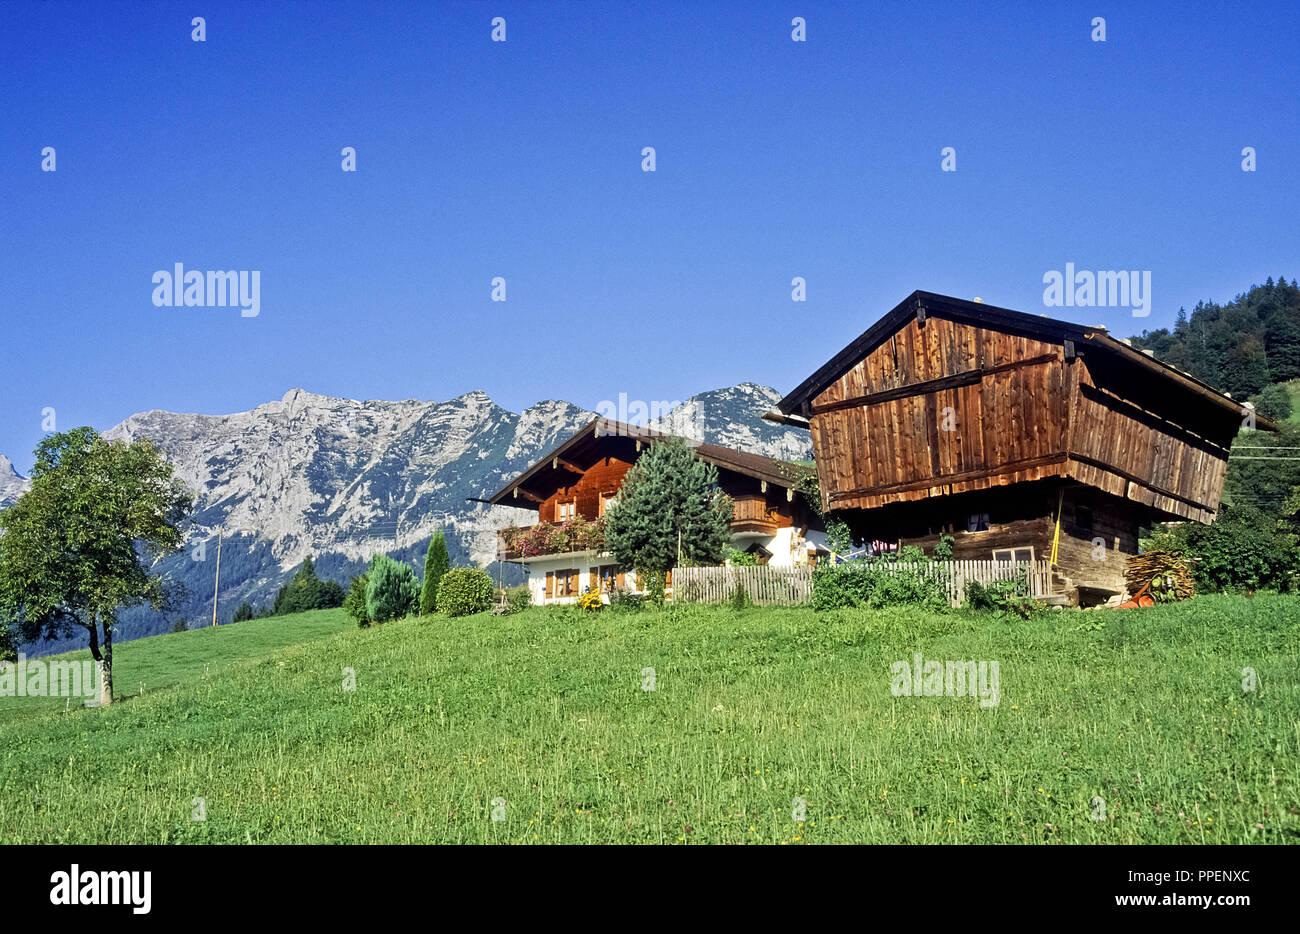 Rural farmsteads - mountain farmhouse - overlooking the Reiter Alpe in Ramsau - Berchtesgaden - Berchtesgadener Land. Stock Photo